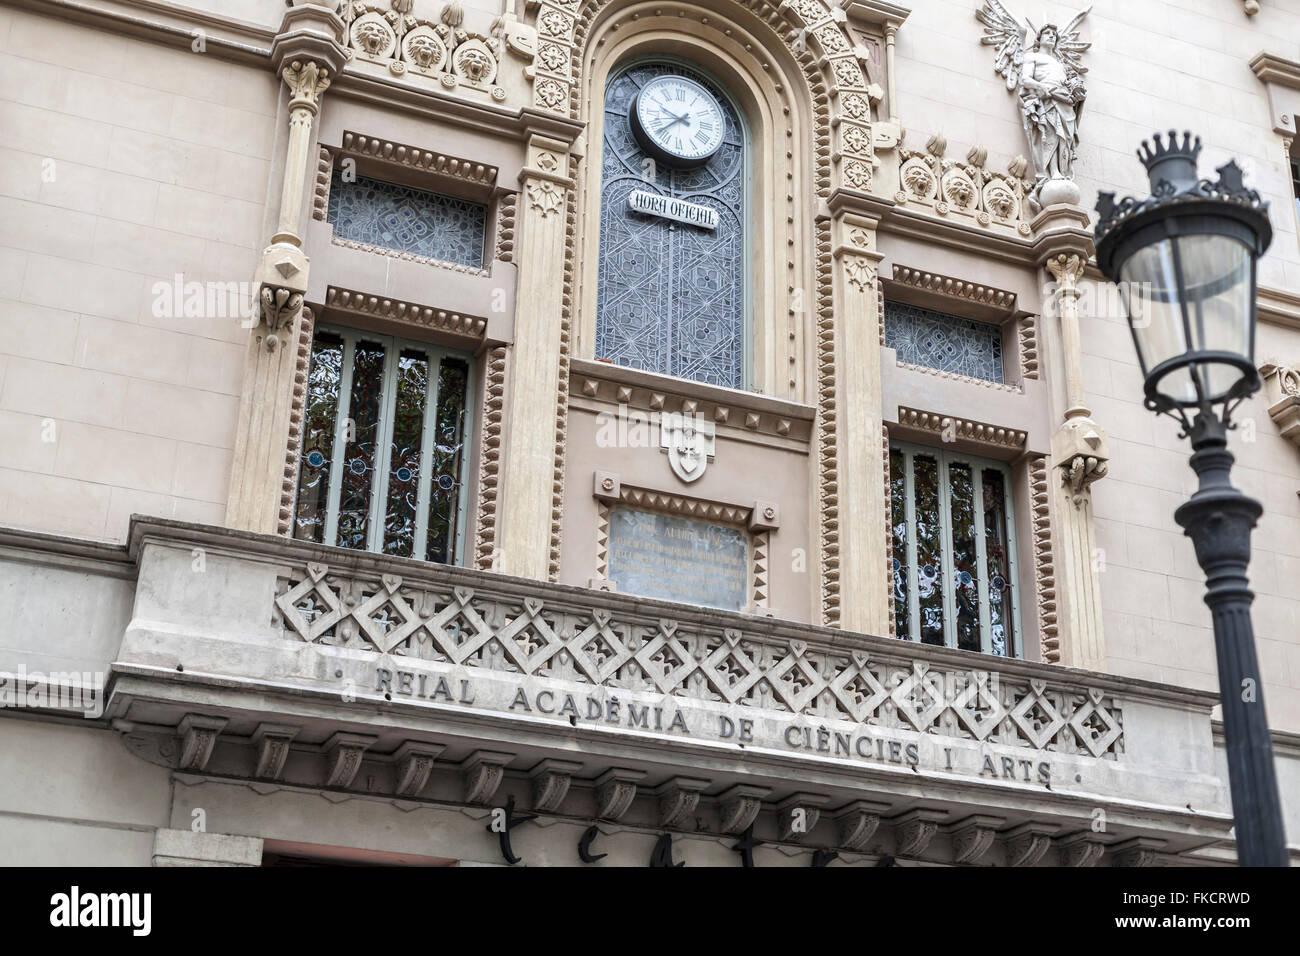 Reial Acadèmia de Ciències i Arts, by Josep Domènech Estapà. Hosts Theater Poliorama, La Rambla, - Stock Image